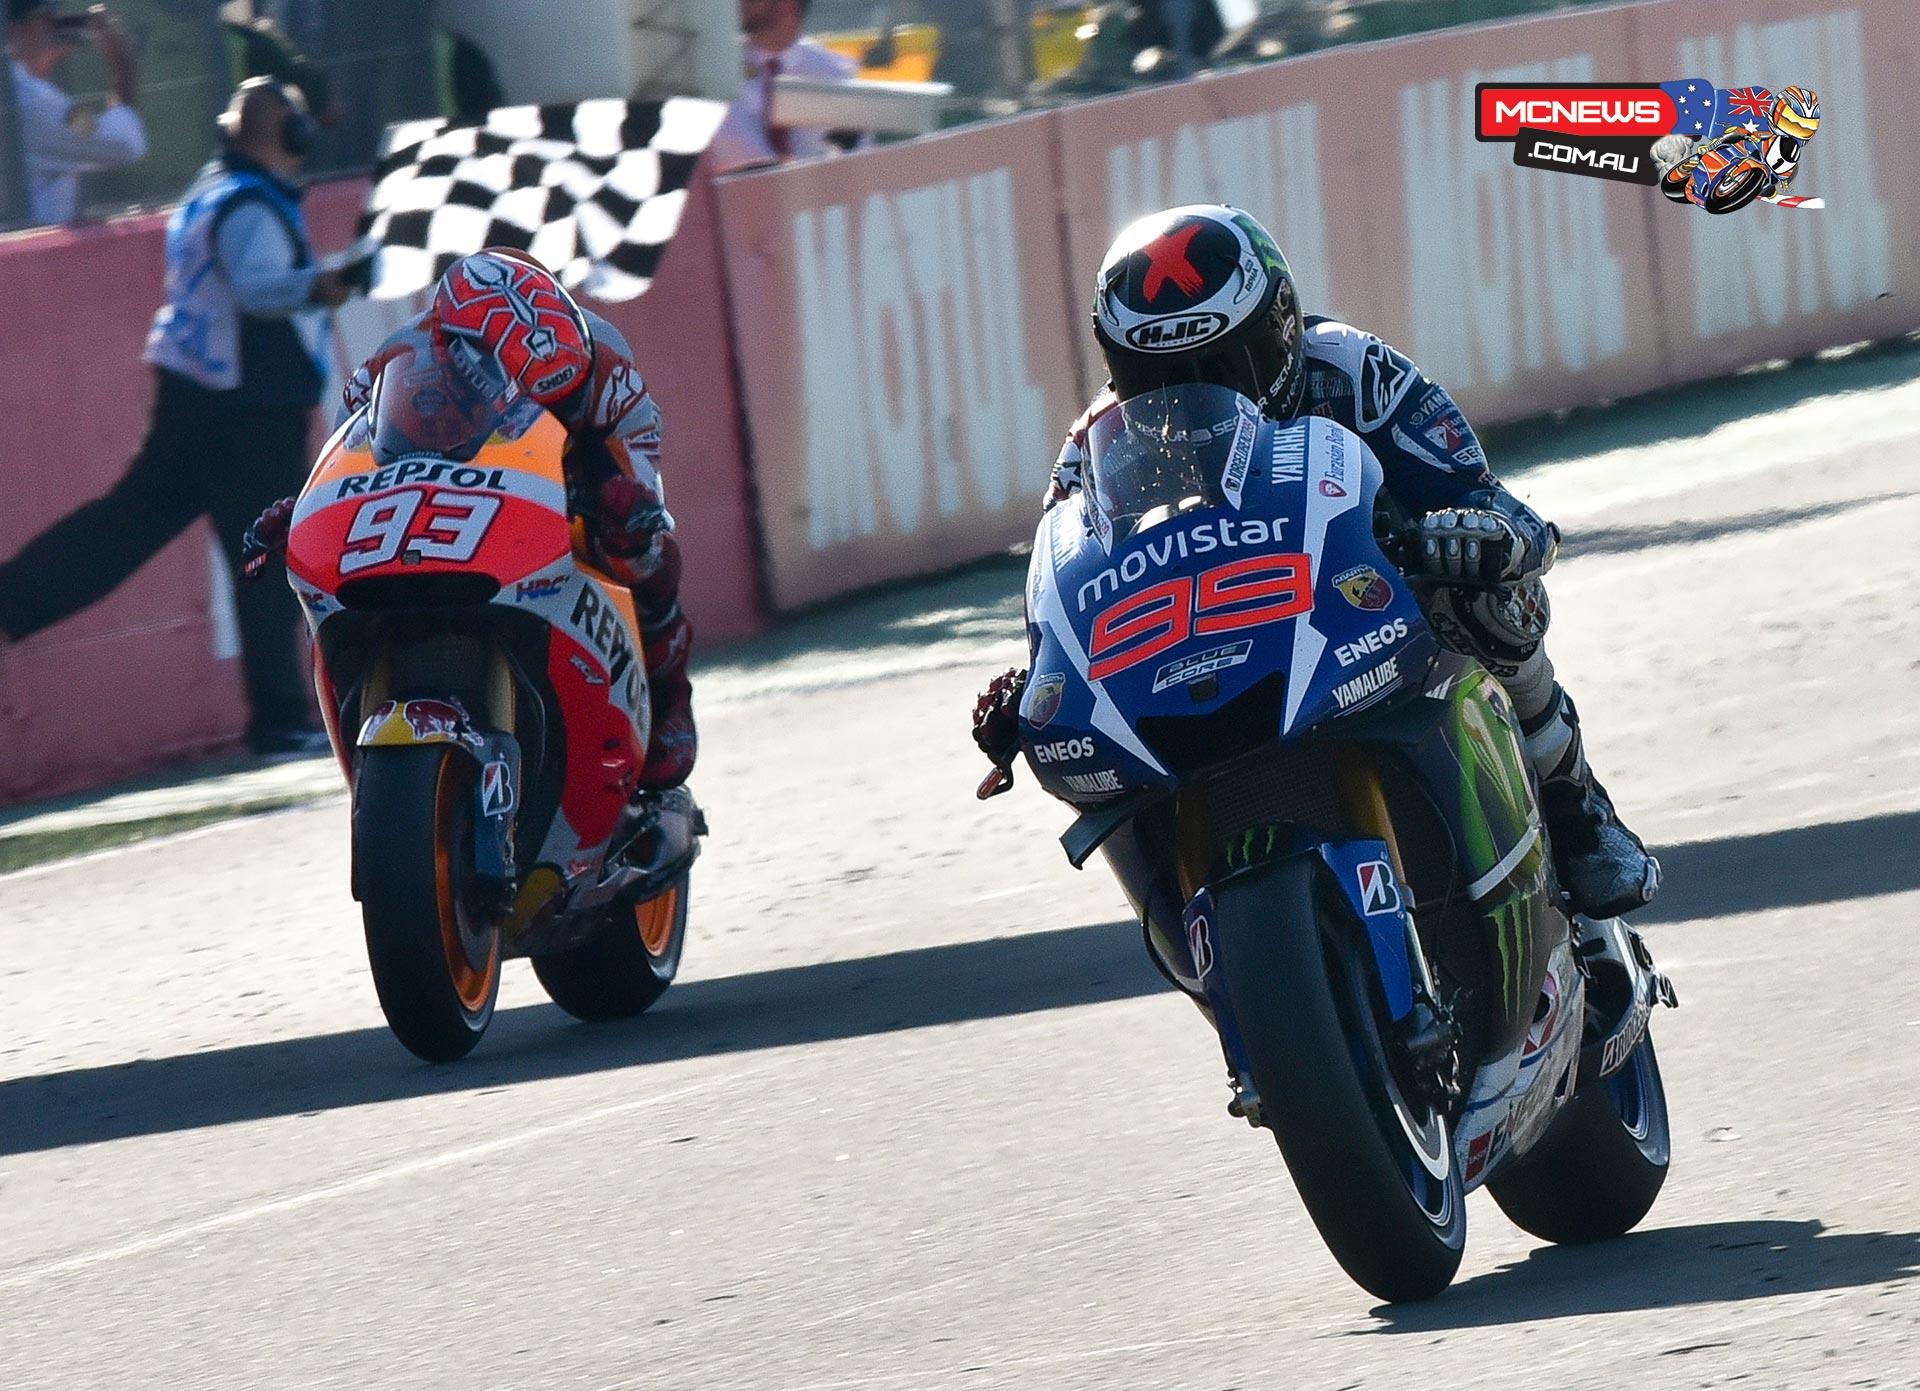 Jorge Lorenzo takes the flag ahead of Marc Marquez